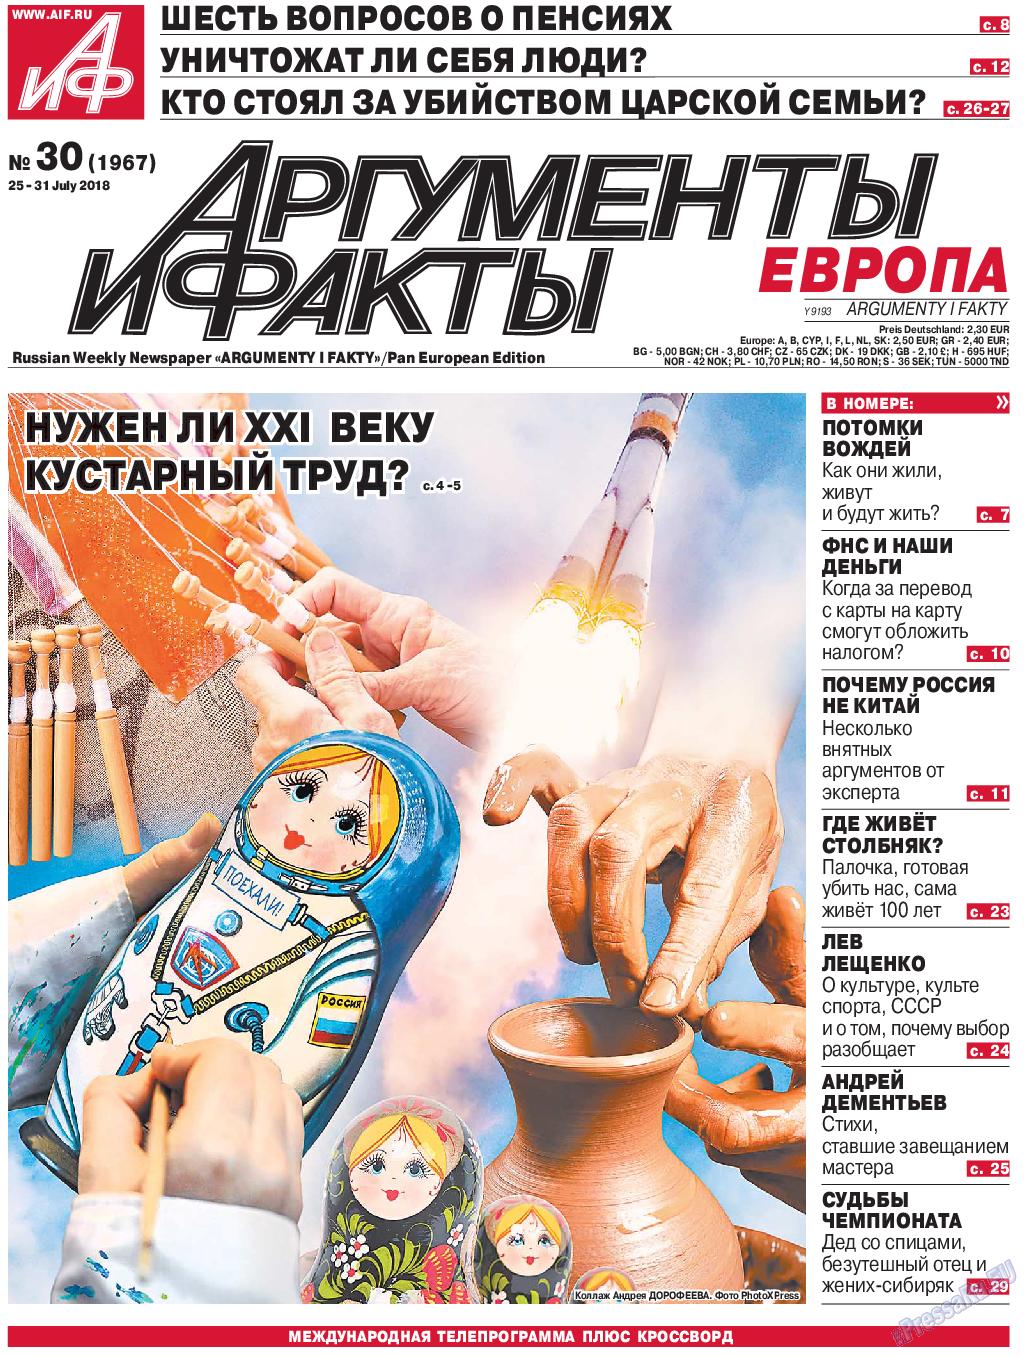 Аргументы и факты Европа (газета). 2018 год, номер 30, стр. 1